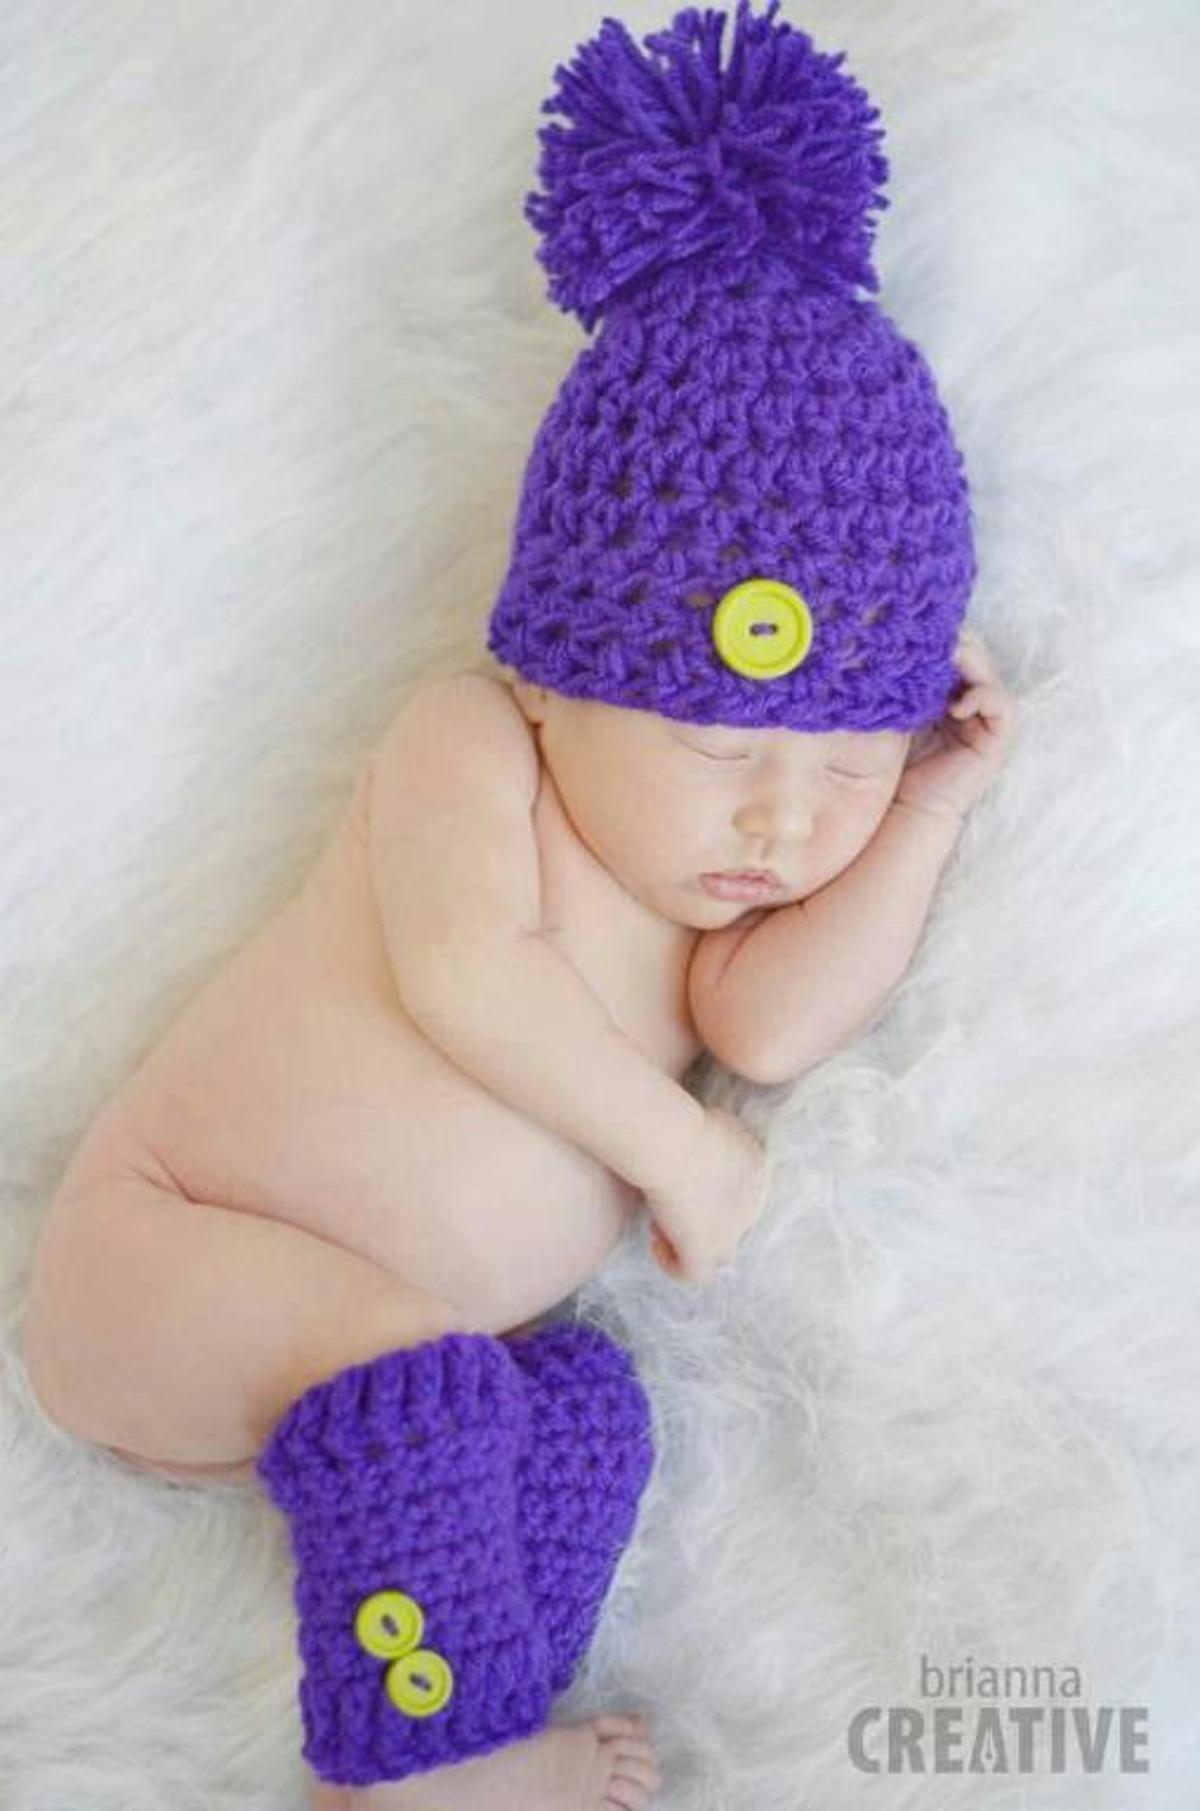 Newborn Button and Lace Hat Crochet Pattern